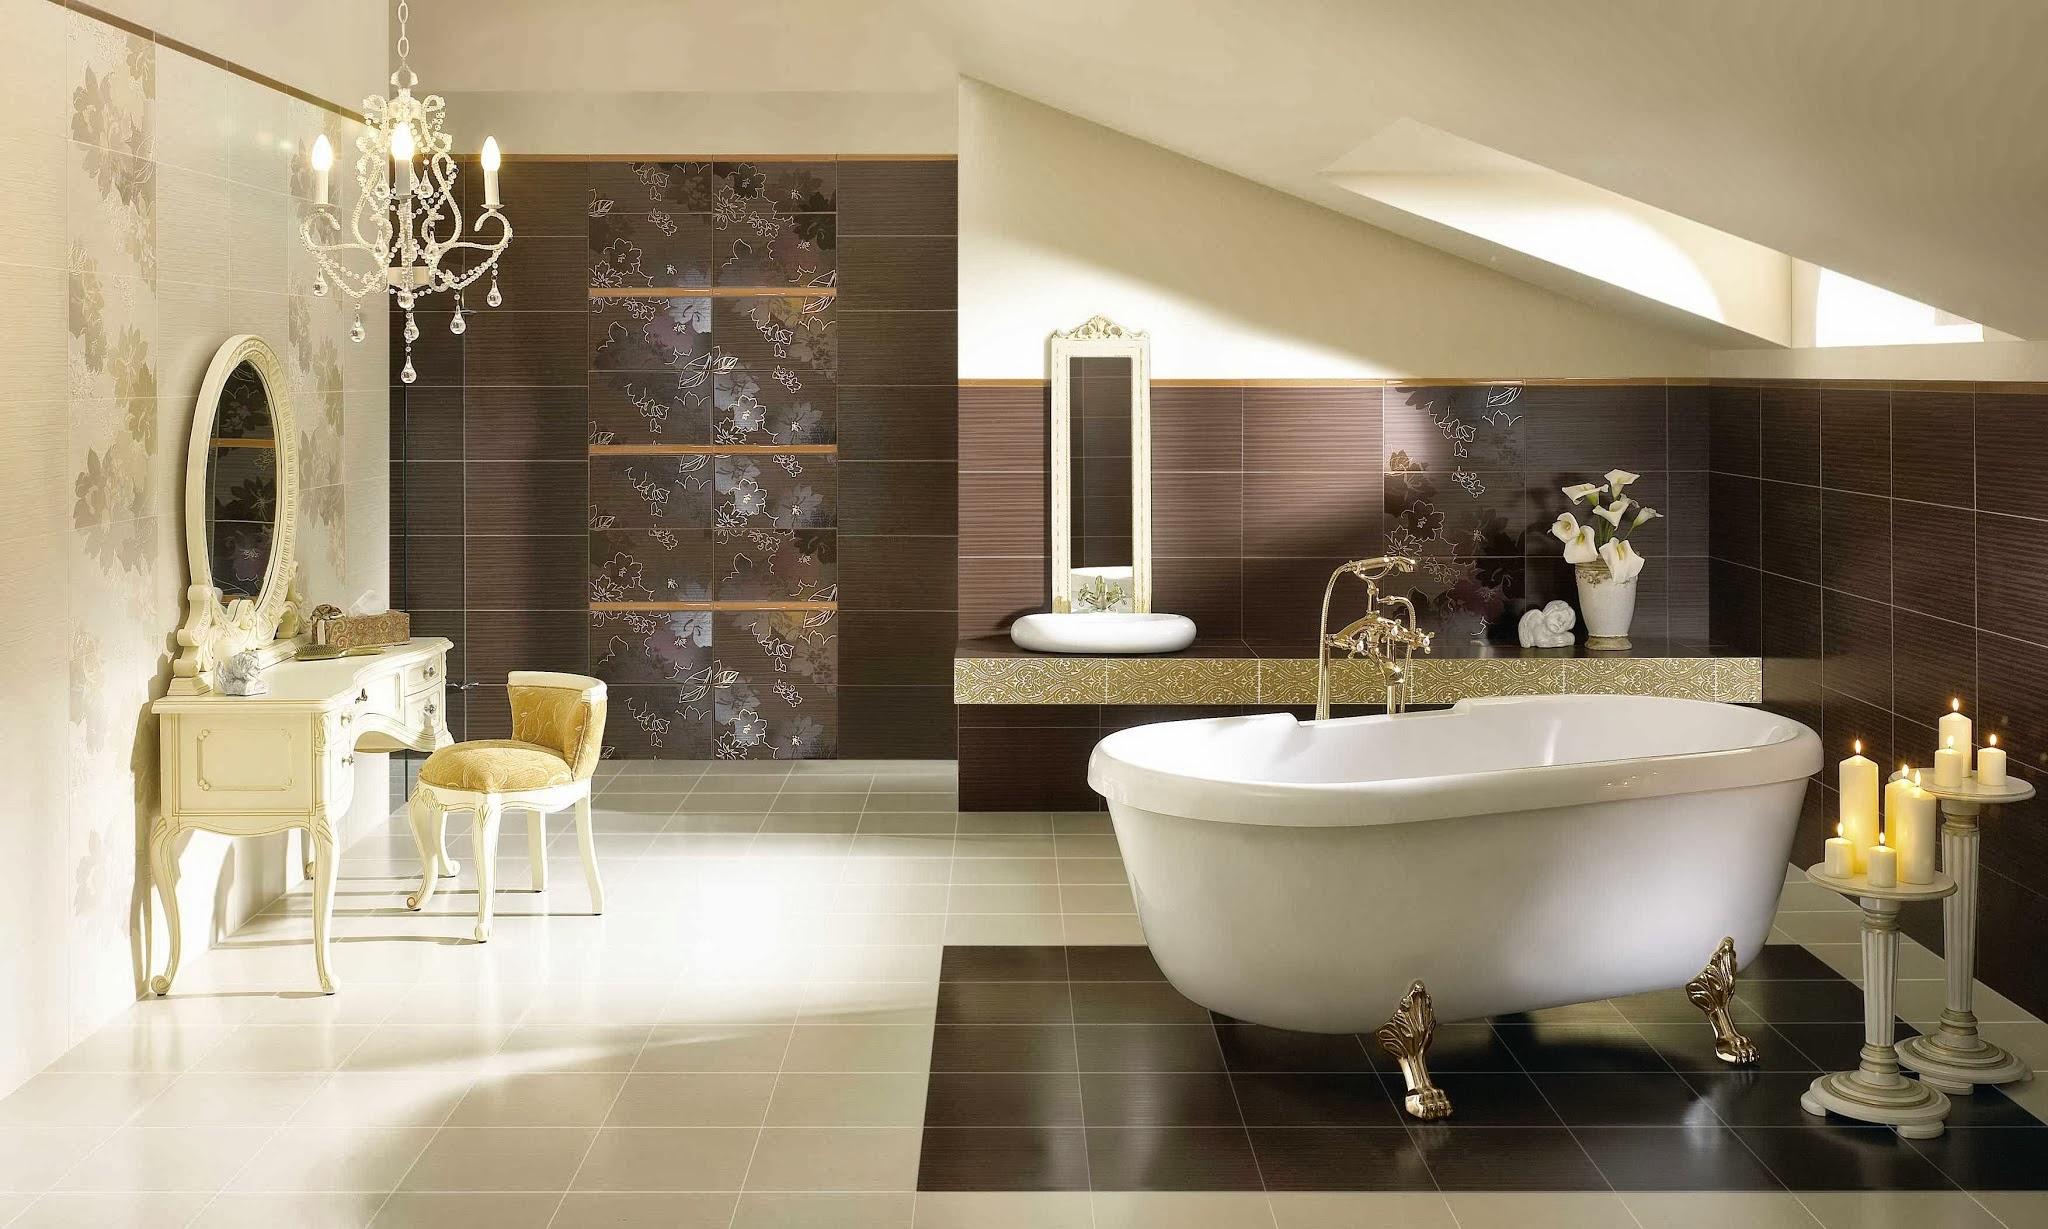 Contemporary ceramic tiles